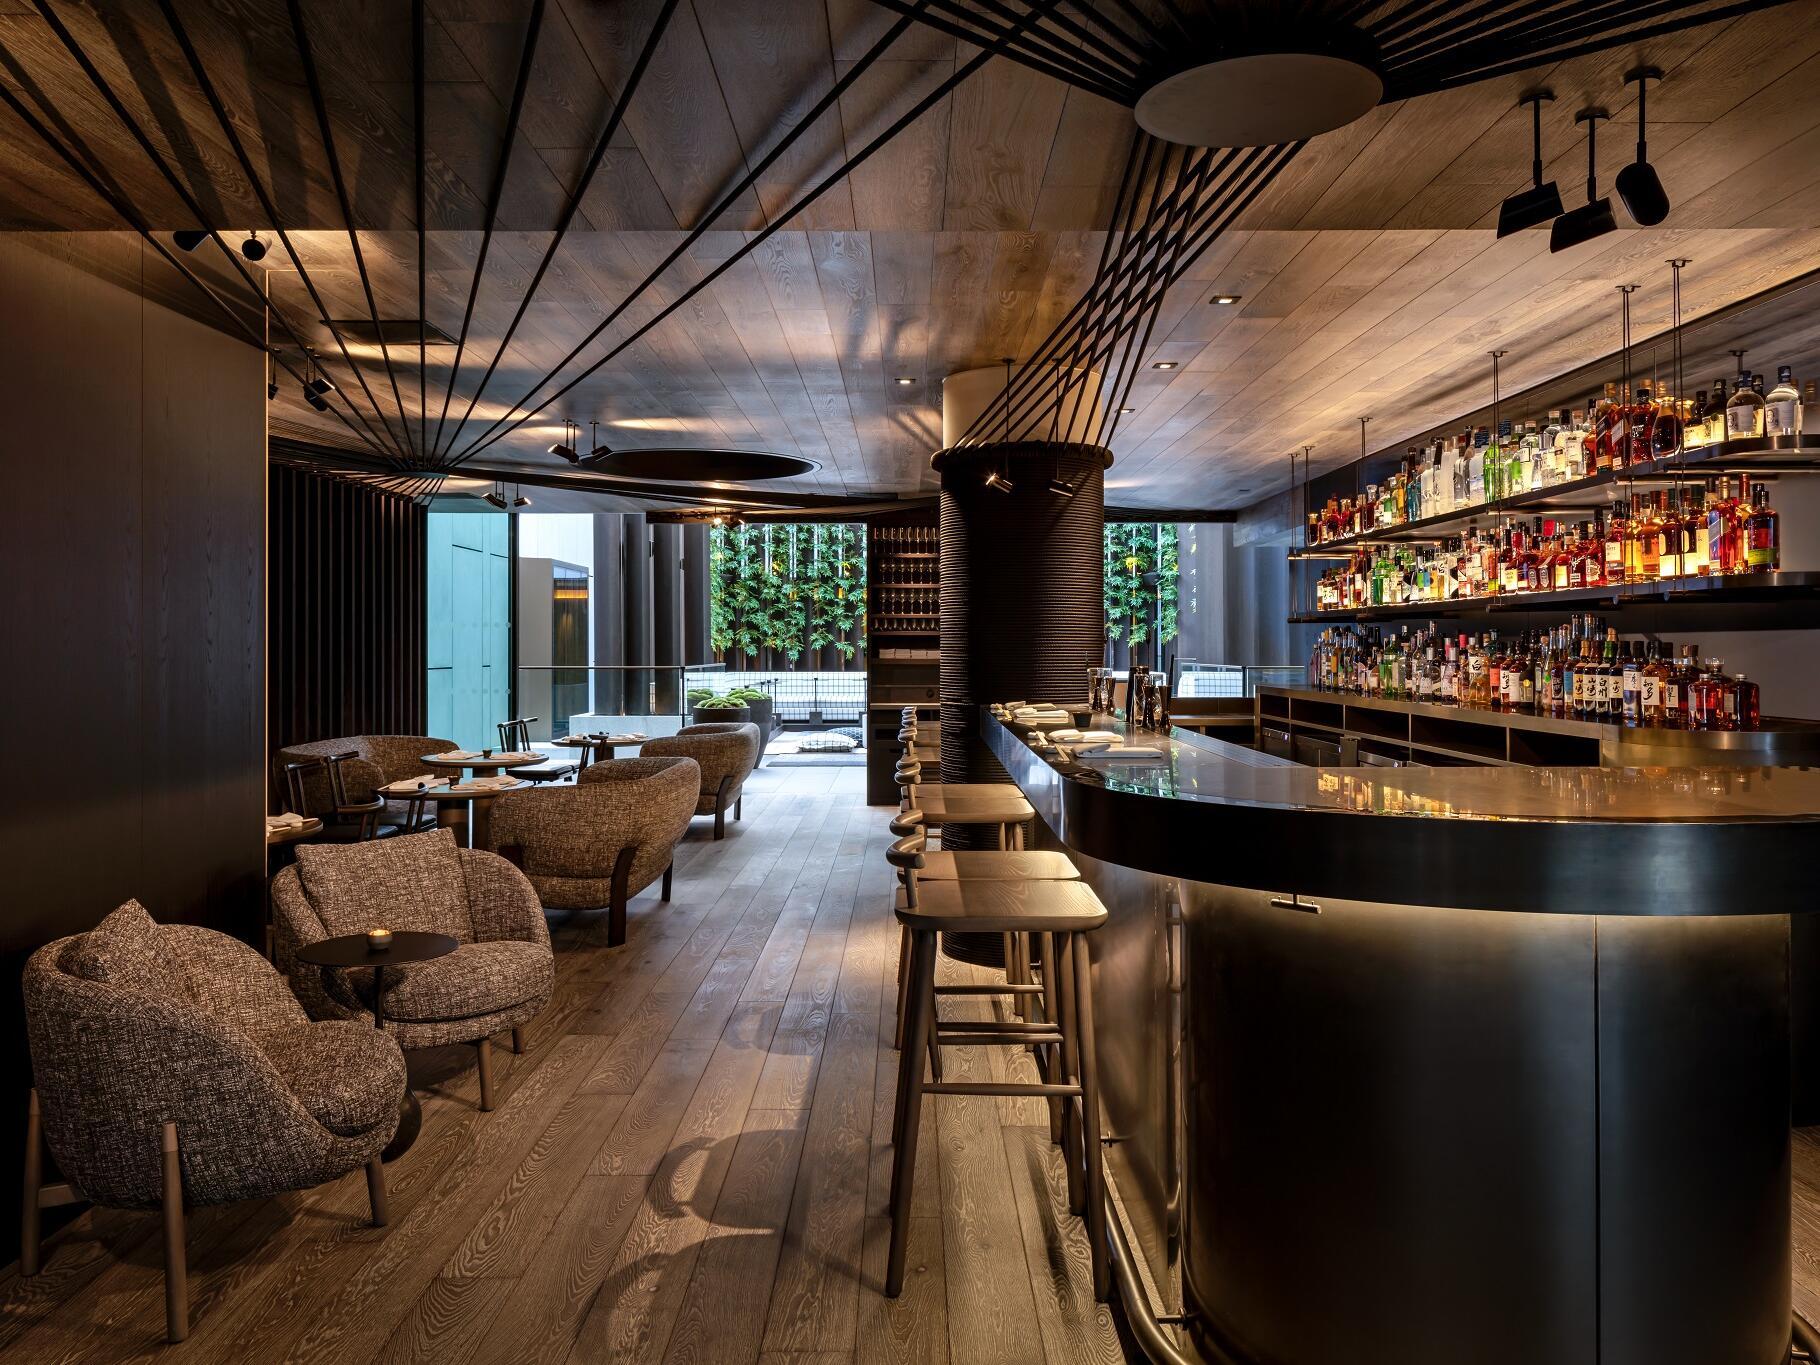 The Londoner - 8 at The Londoner - Bar